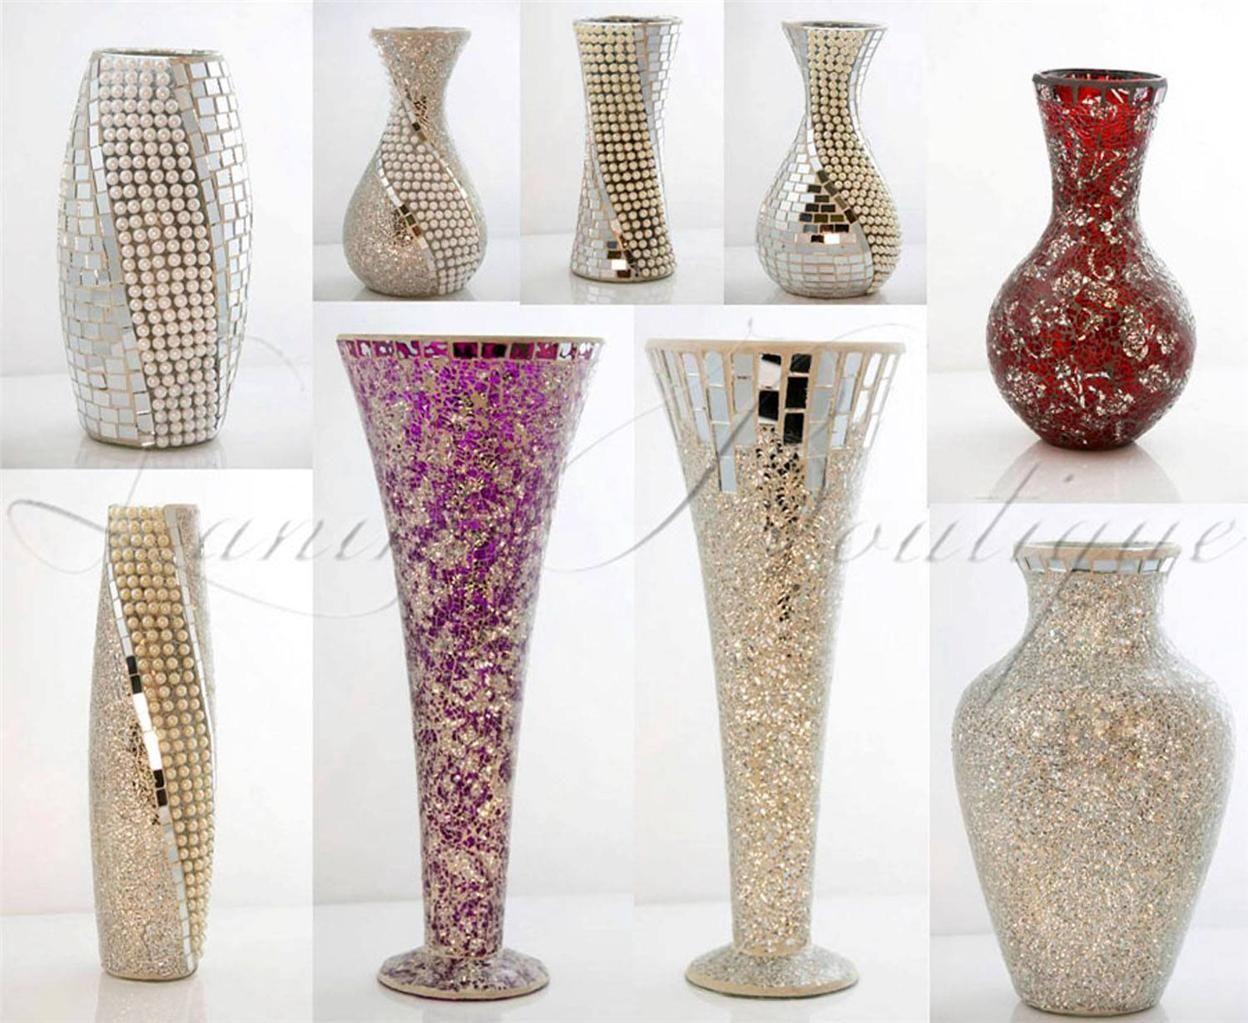 Mosaic glass bottles vases google search mosaic art decor mosaic glass bottles vases google search reviewsmspy